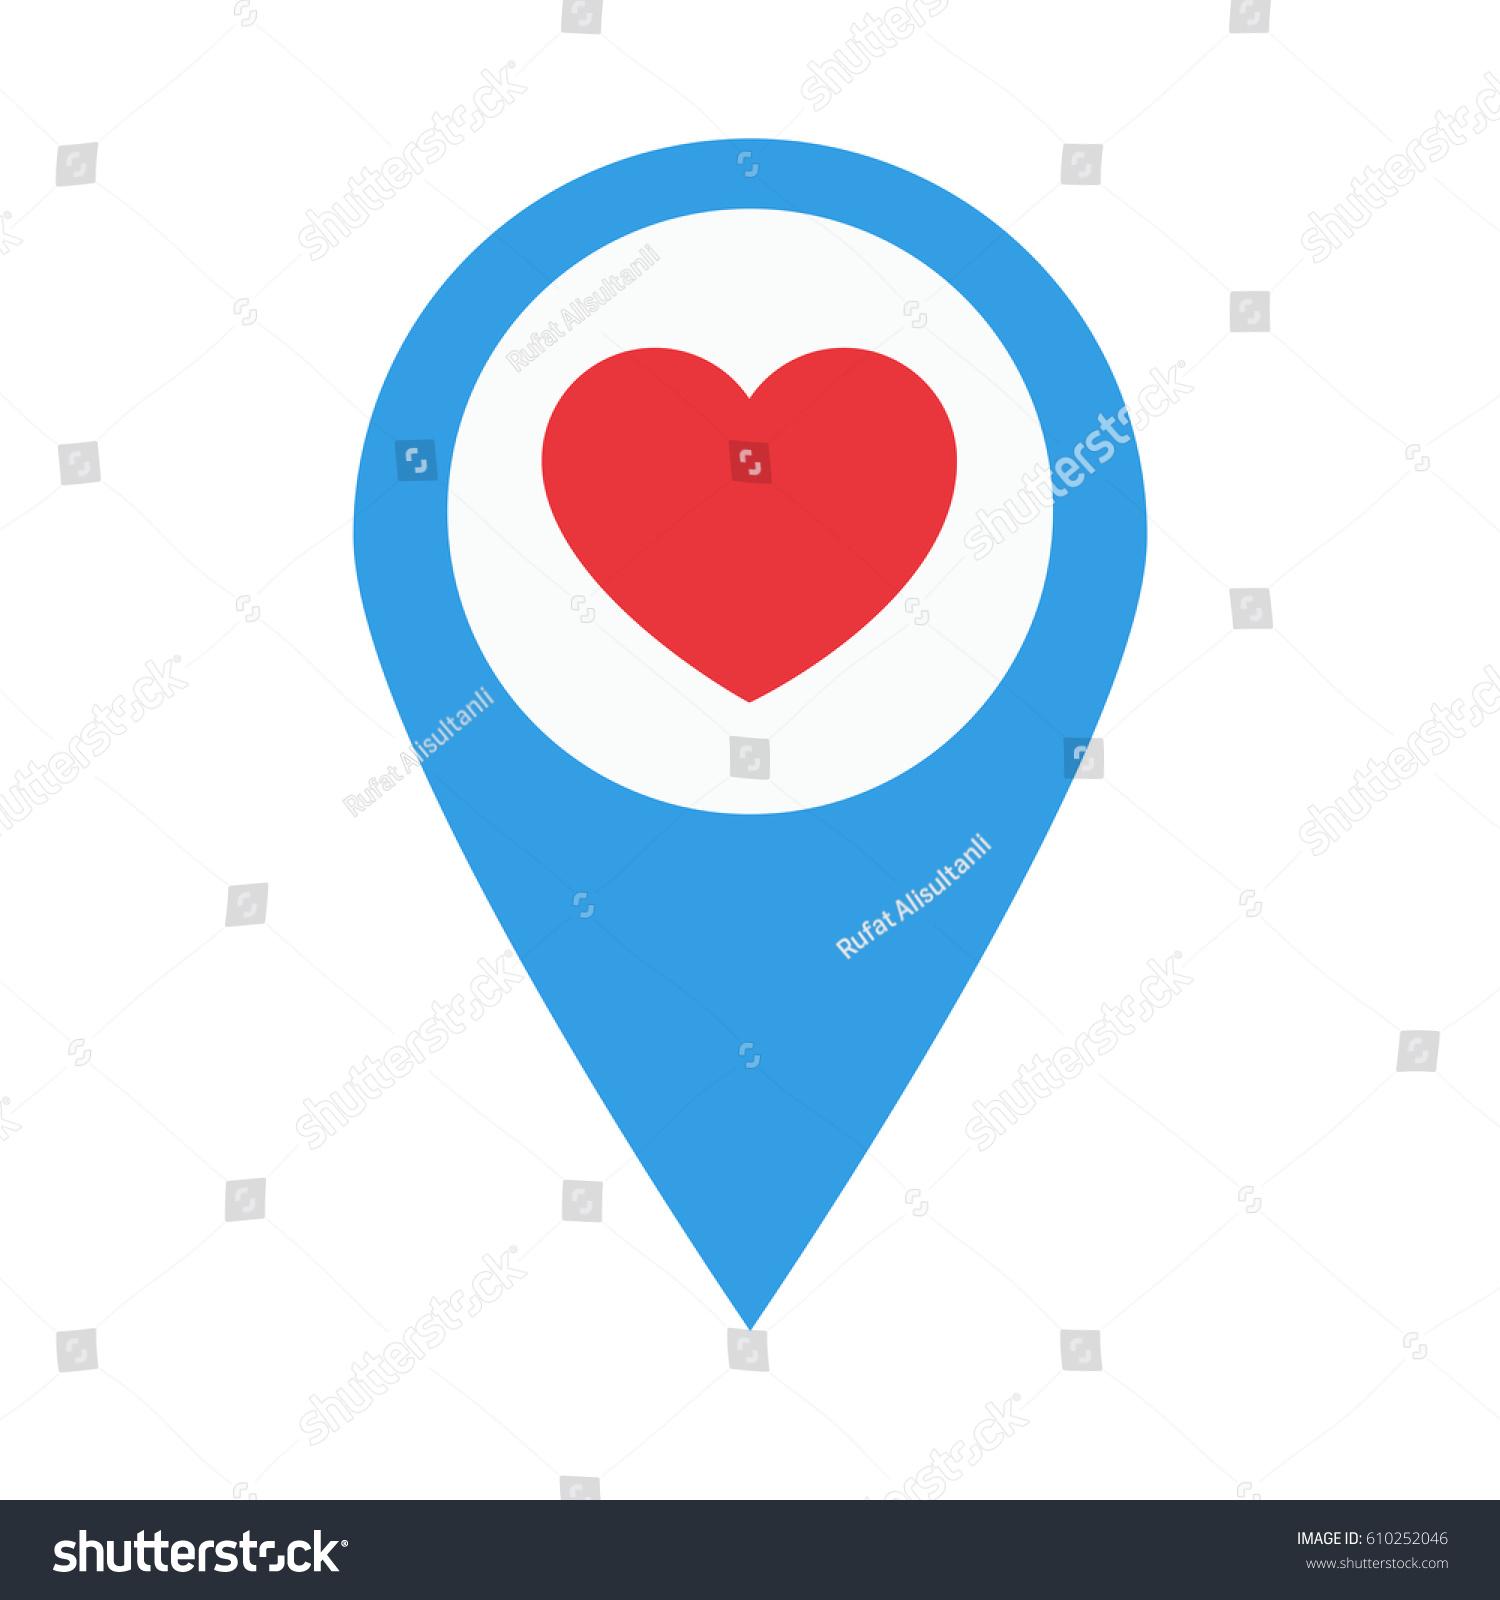 Heart symbol location design flat icon stock vector for Location design